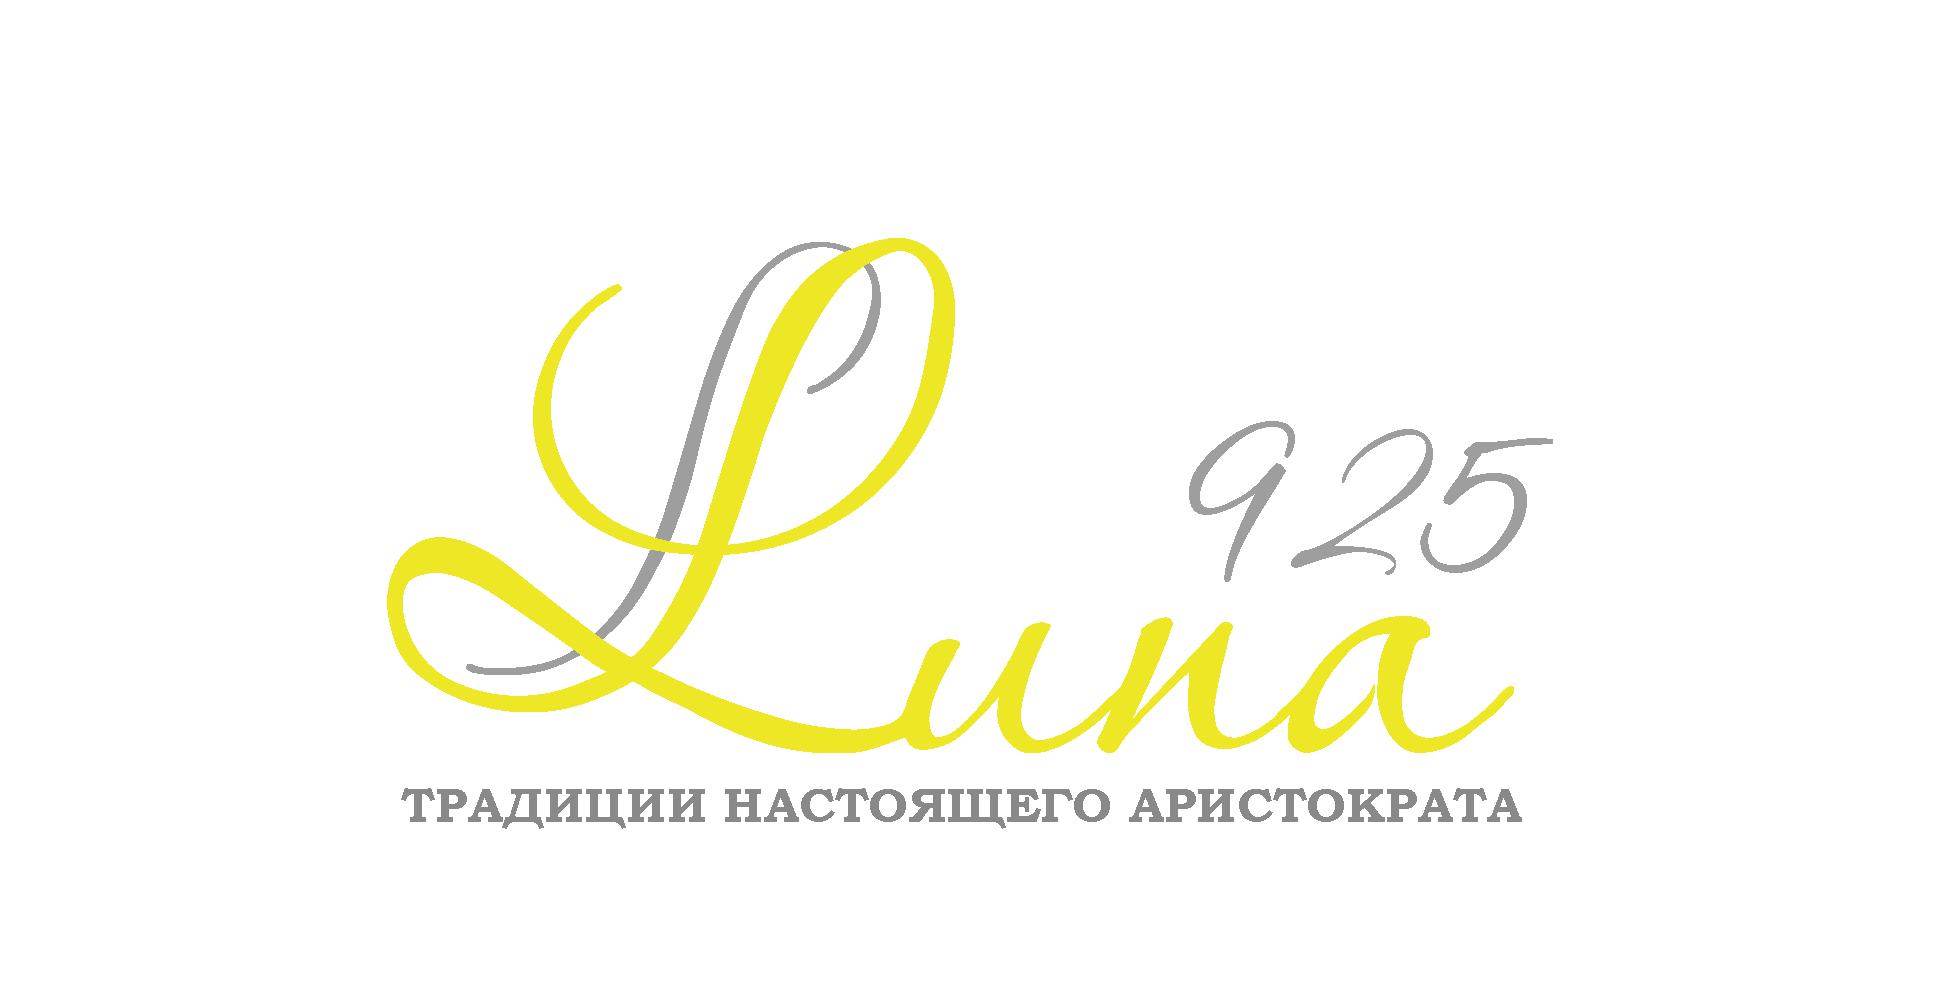 Логотип для столового серебра и посуды из серебра фото f_8015babe6acd852f.png